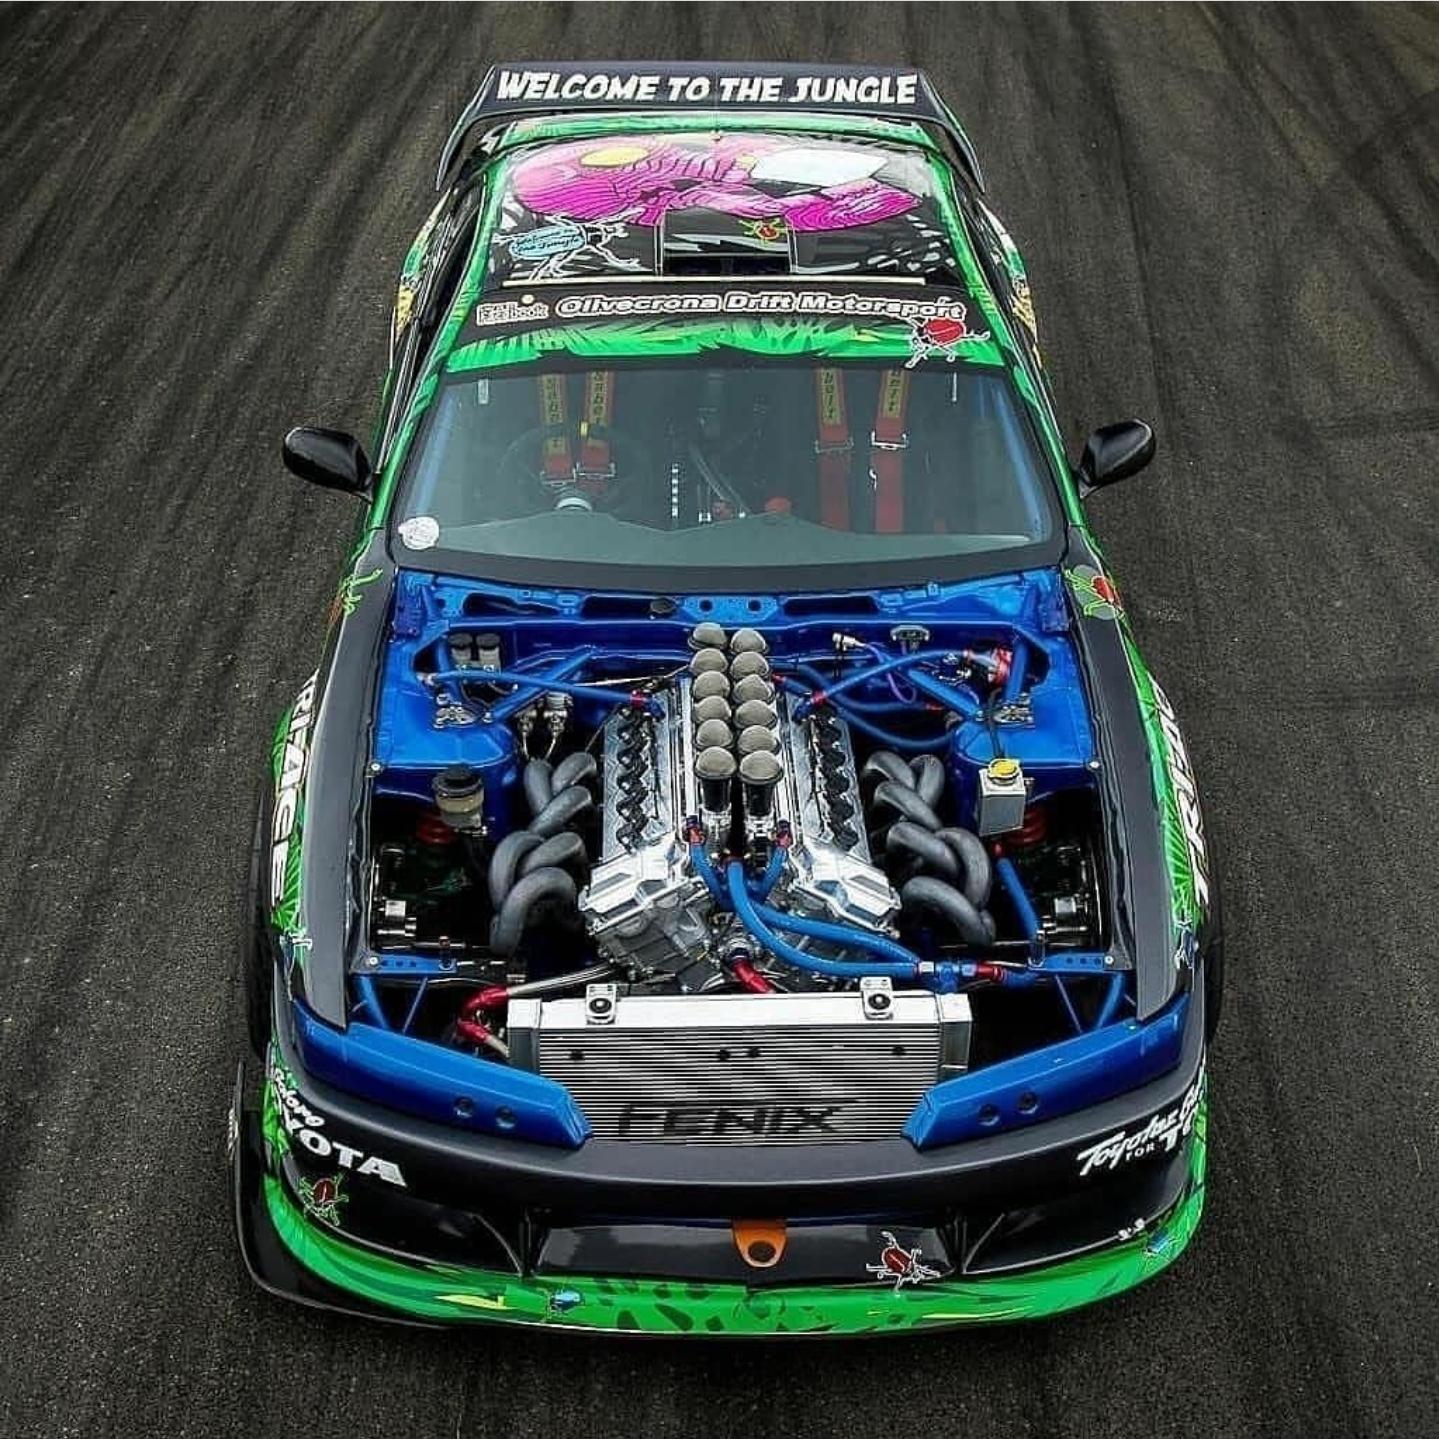 Nissan Silvia S14 V12 Powered Drift Car